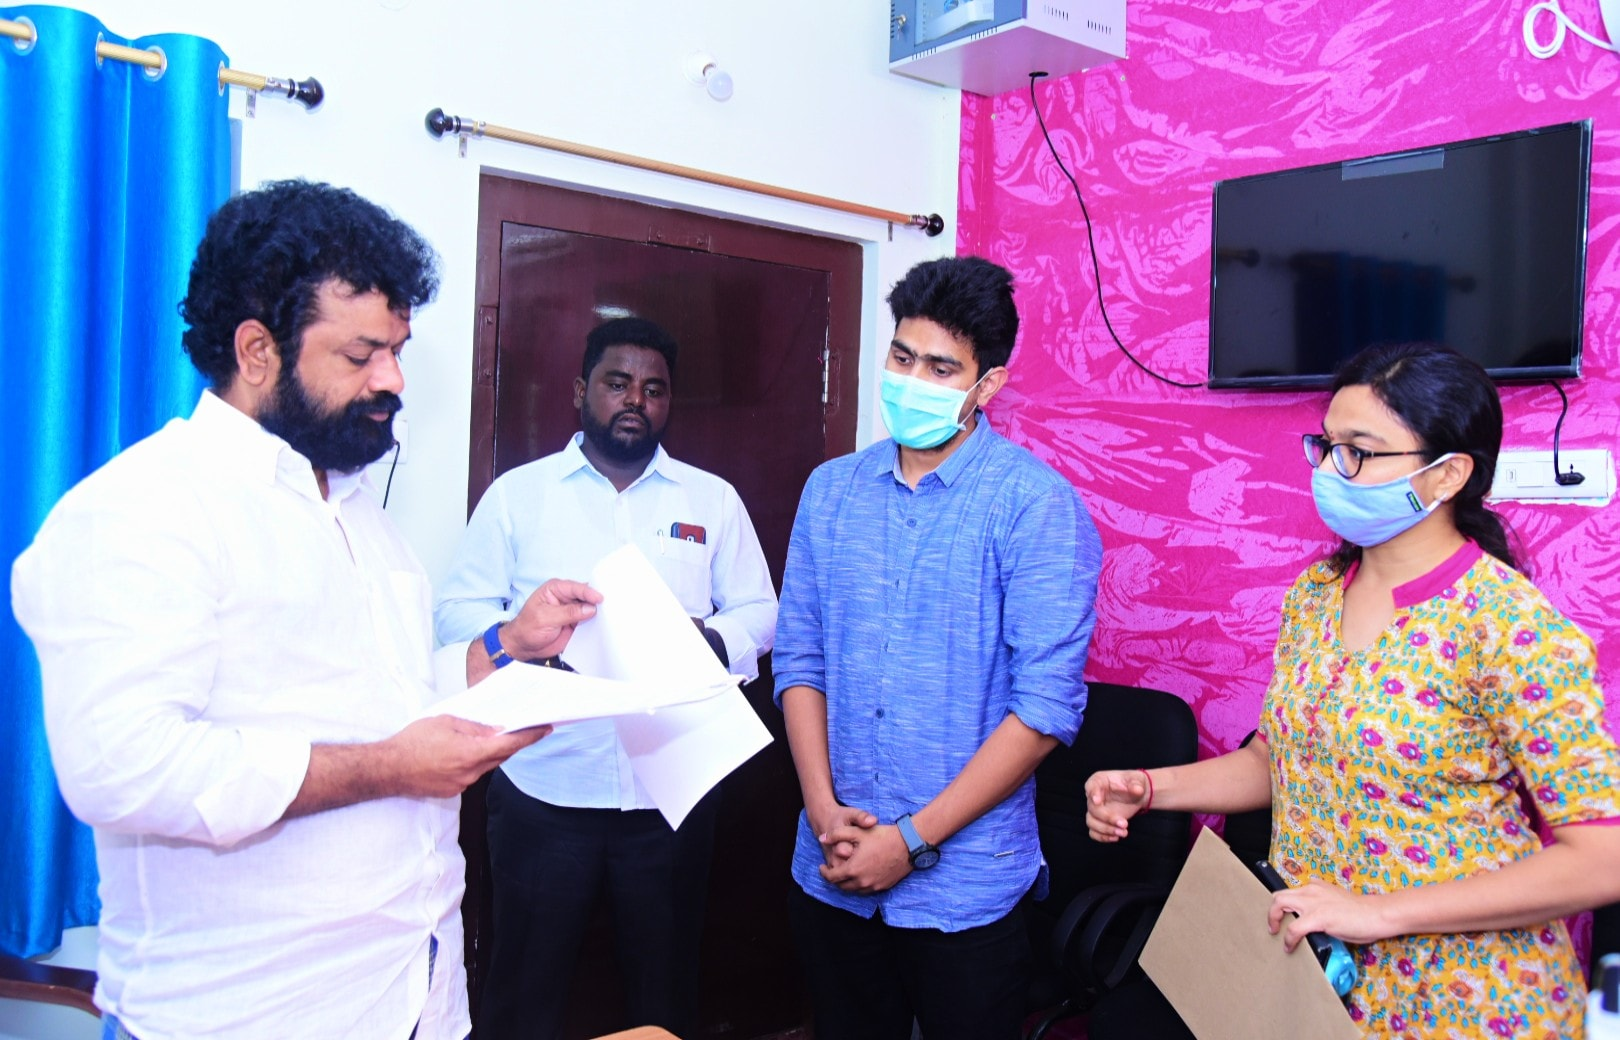 Nandigam Suresh | MP | Leader | Member of Standing Committee on Chemicals & Fertilisers | Member of Consultative Committee & Ministry of Steel | Photographer | YSRCP | Uddandarayunipalem | Guntur | Bapatla | Andhra Pradesh | theLeadersPage